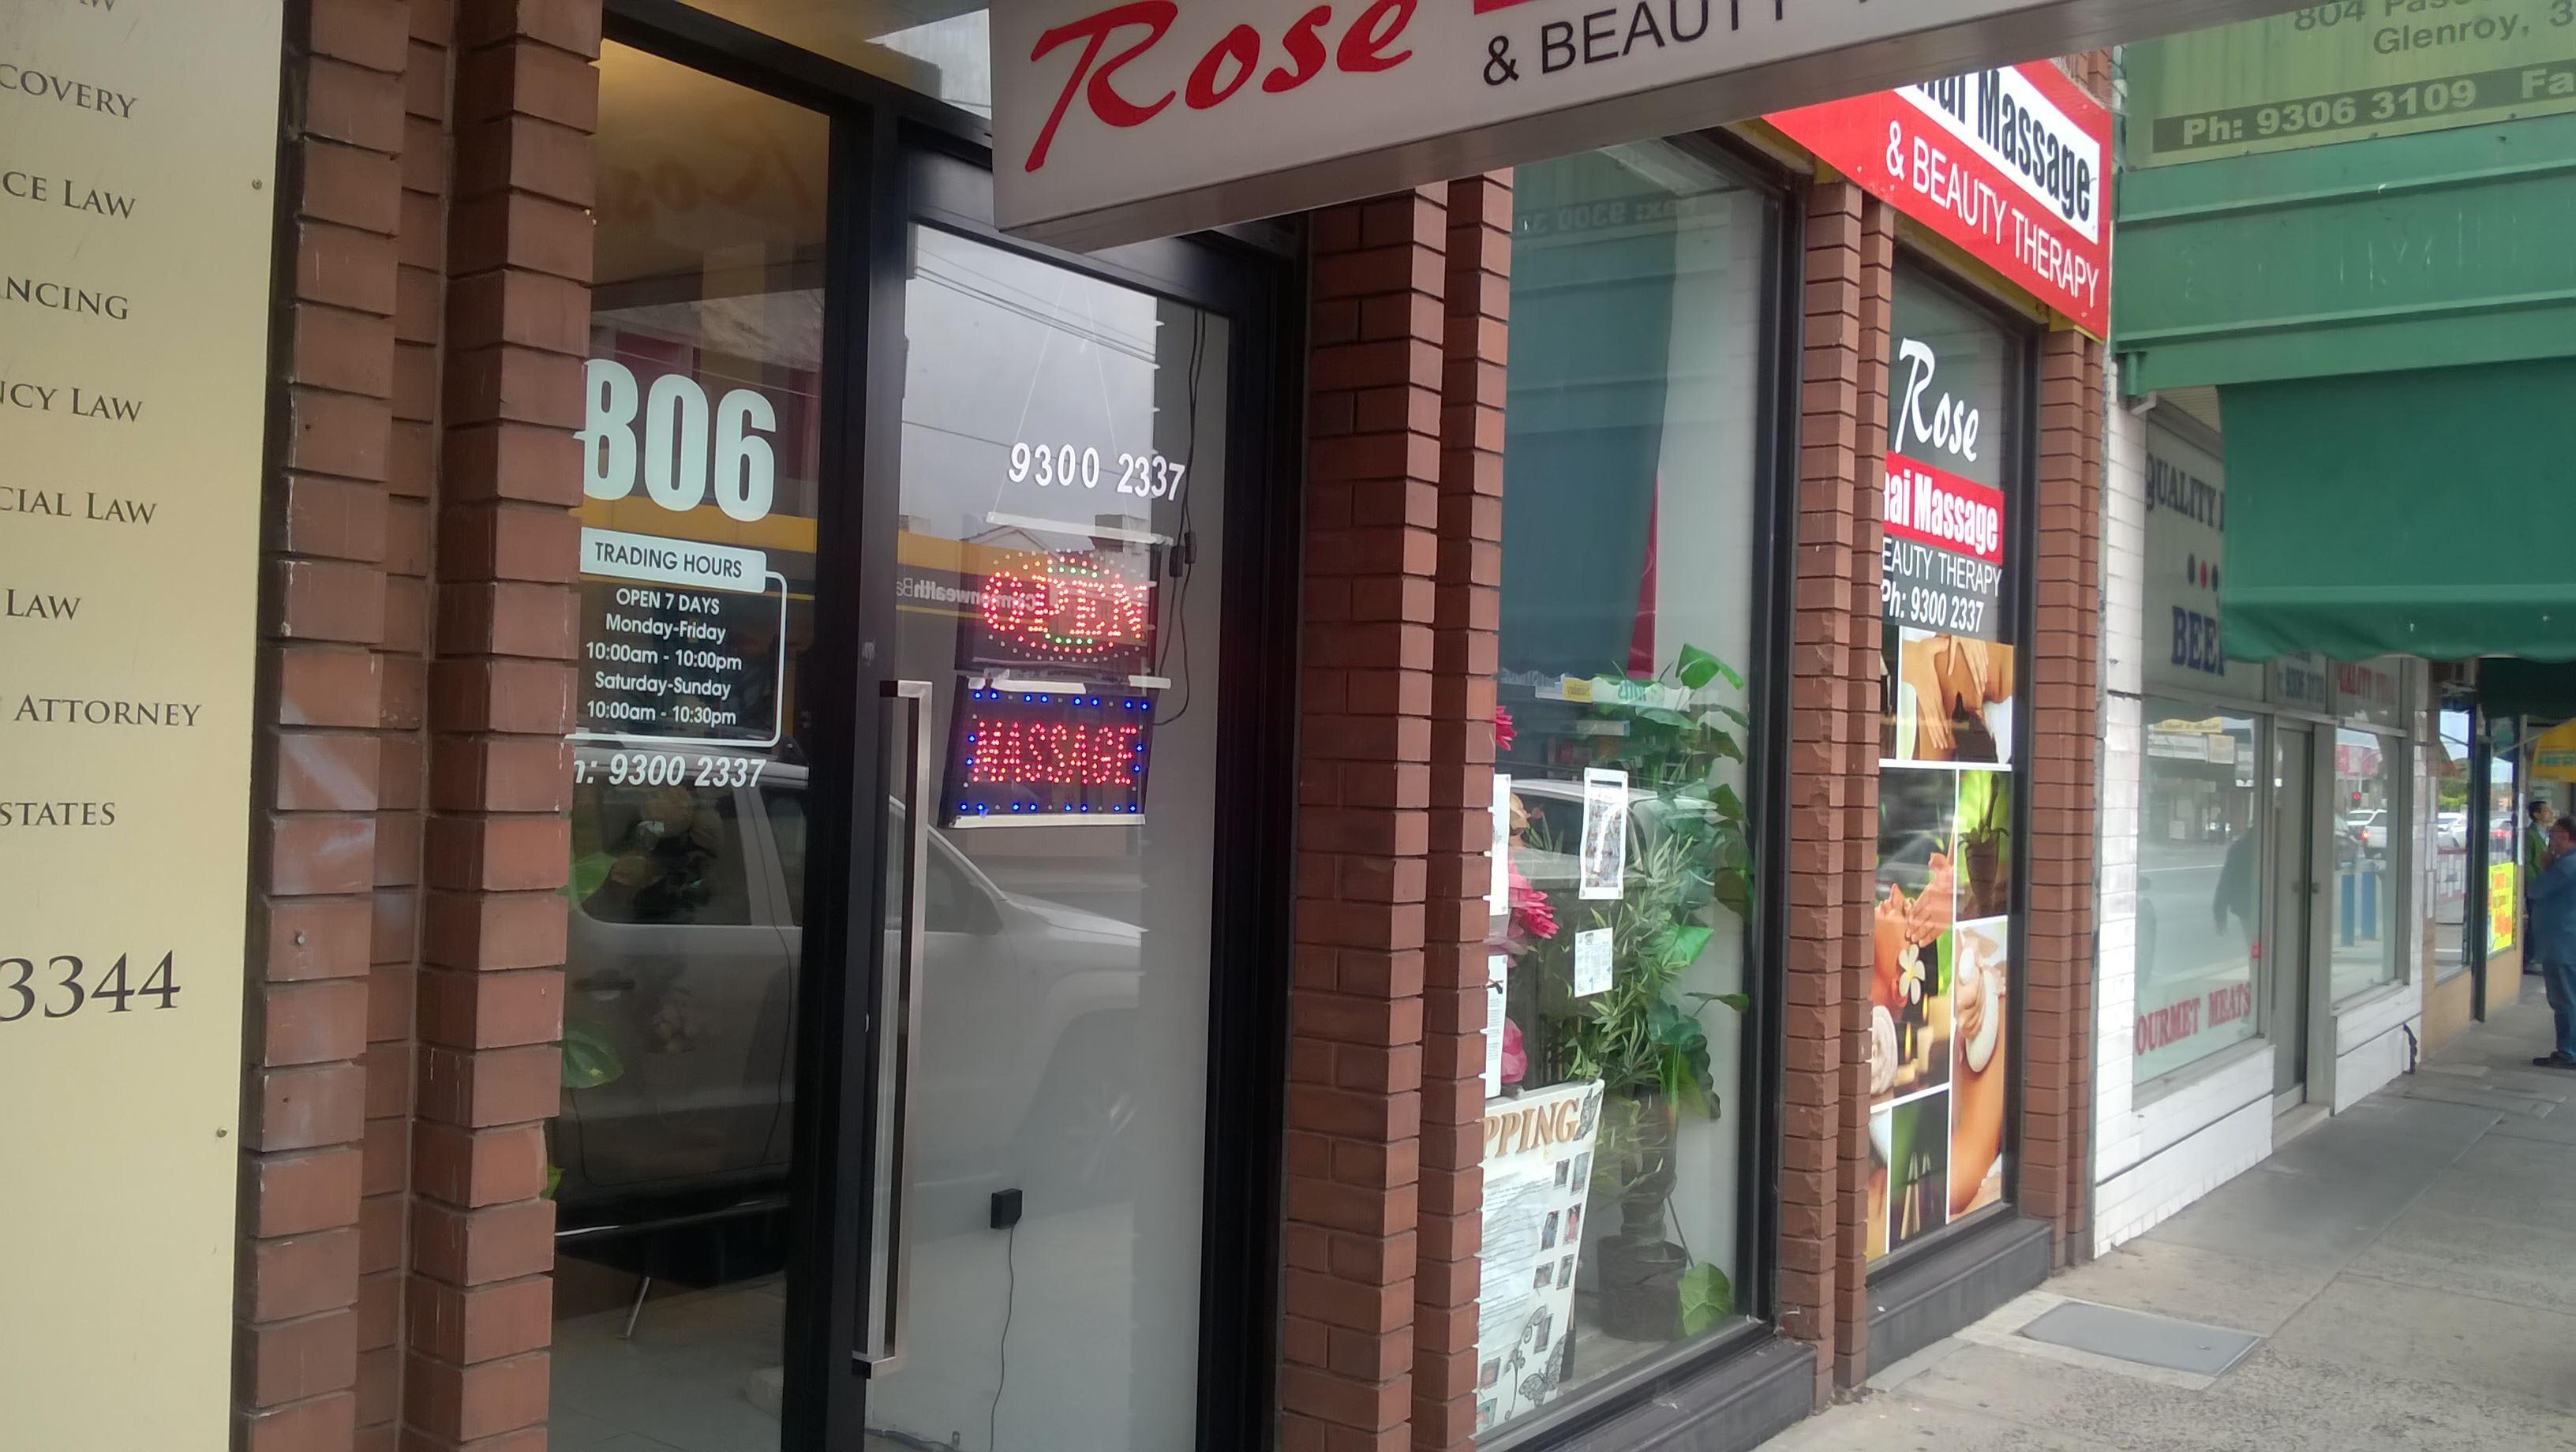 Massage | Thai Massage | Rose Thai Massage & Rose Thai Massage | Thai Massage | Massage